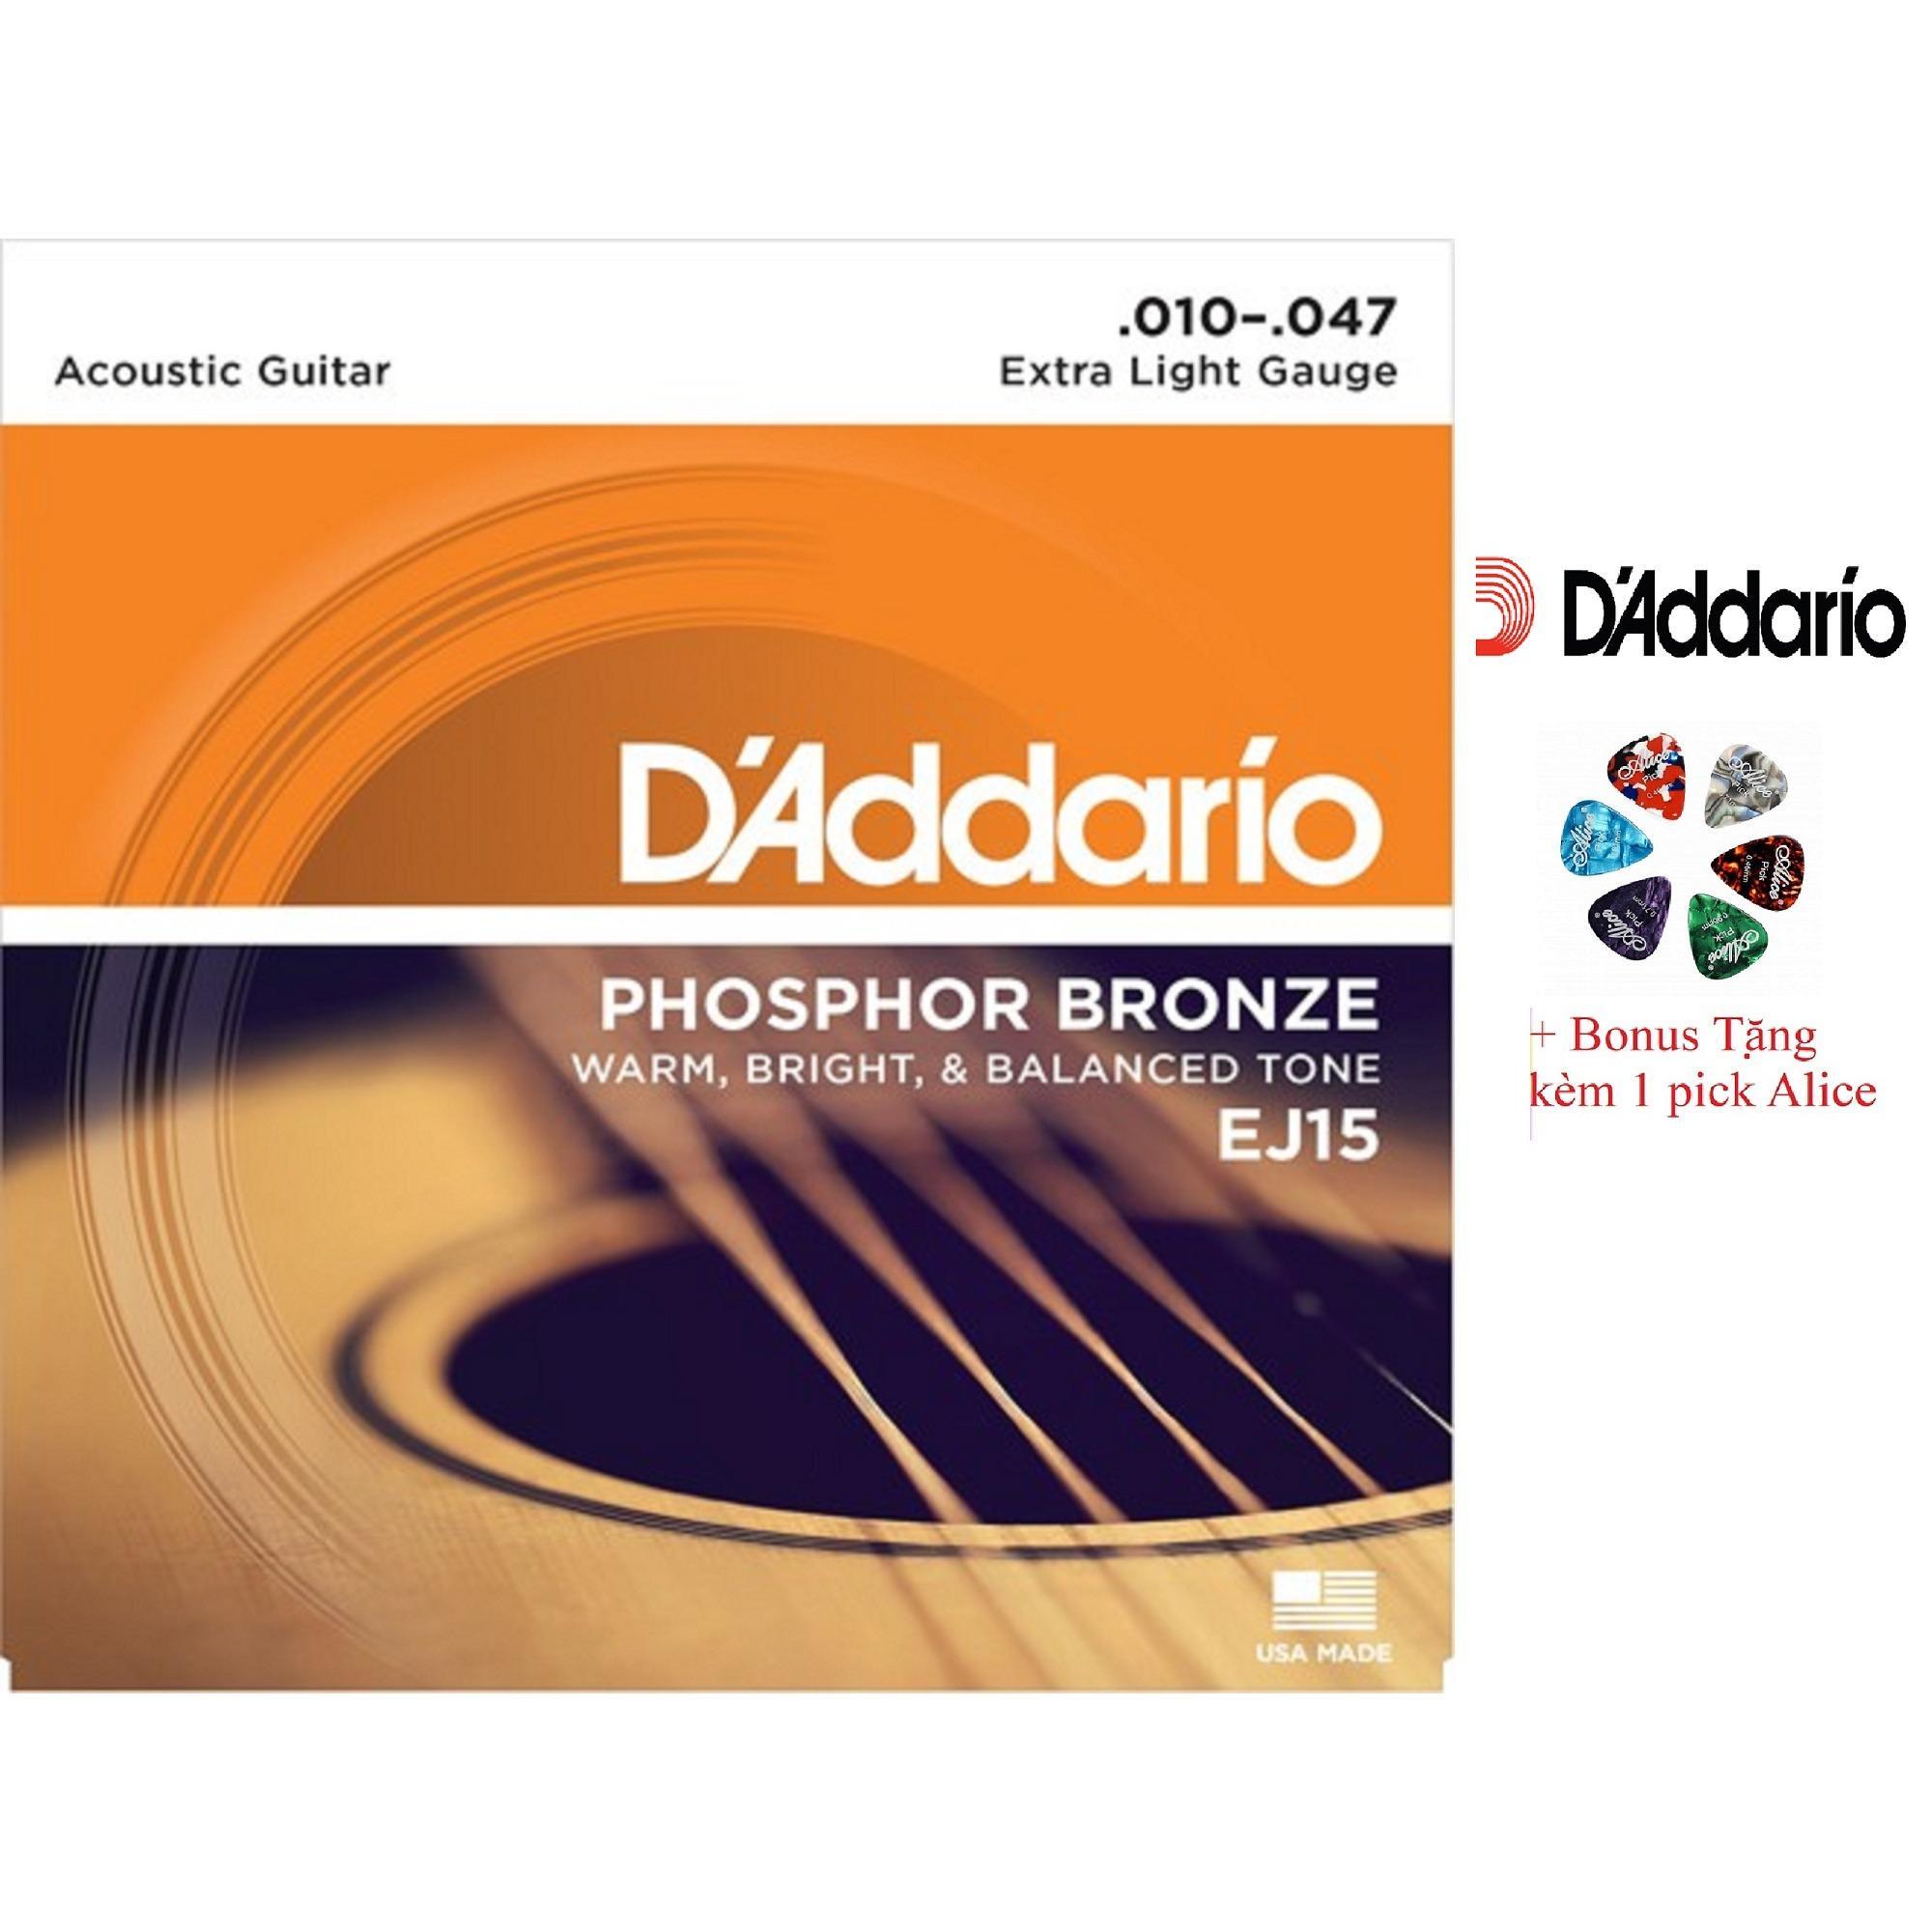 Bộ Hộp 6 Day Đan Guitar Acoustic D Addario Ej15 Cao Cấp Pick Alice Cỡ 10 D Addadrio Chiết Khấu 30